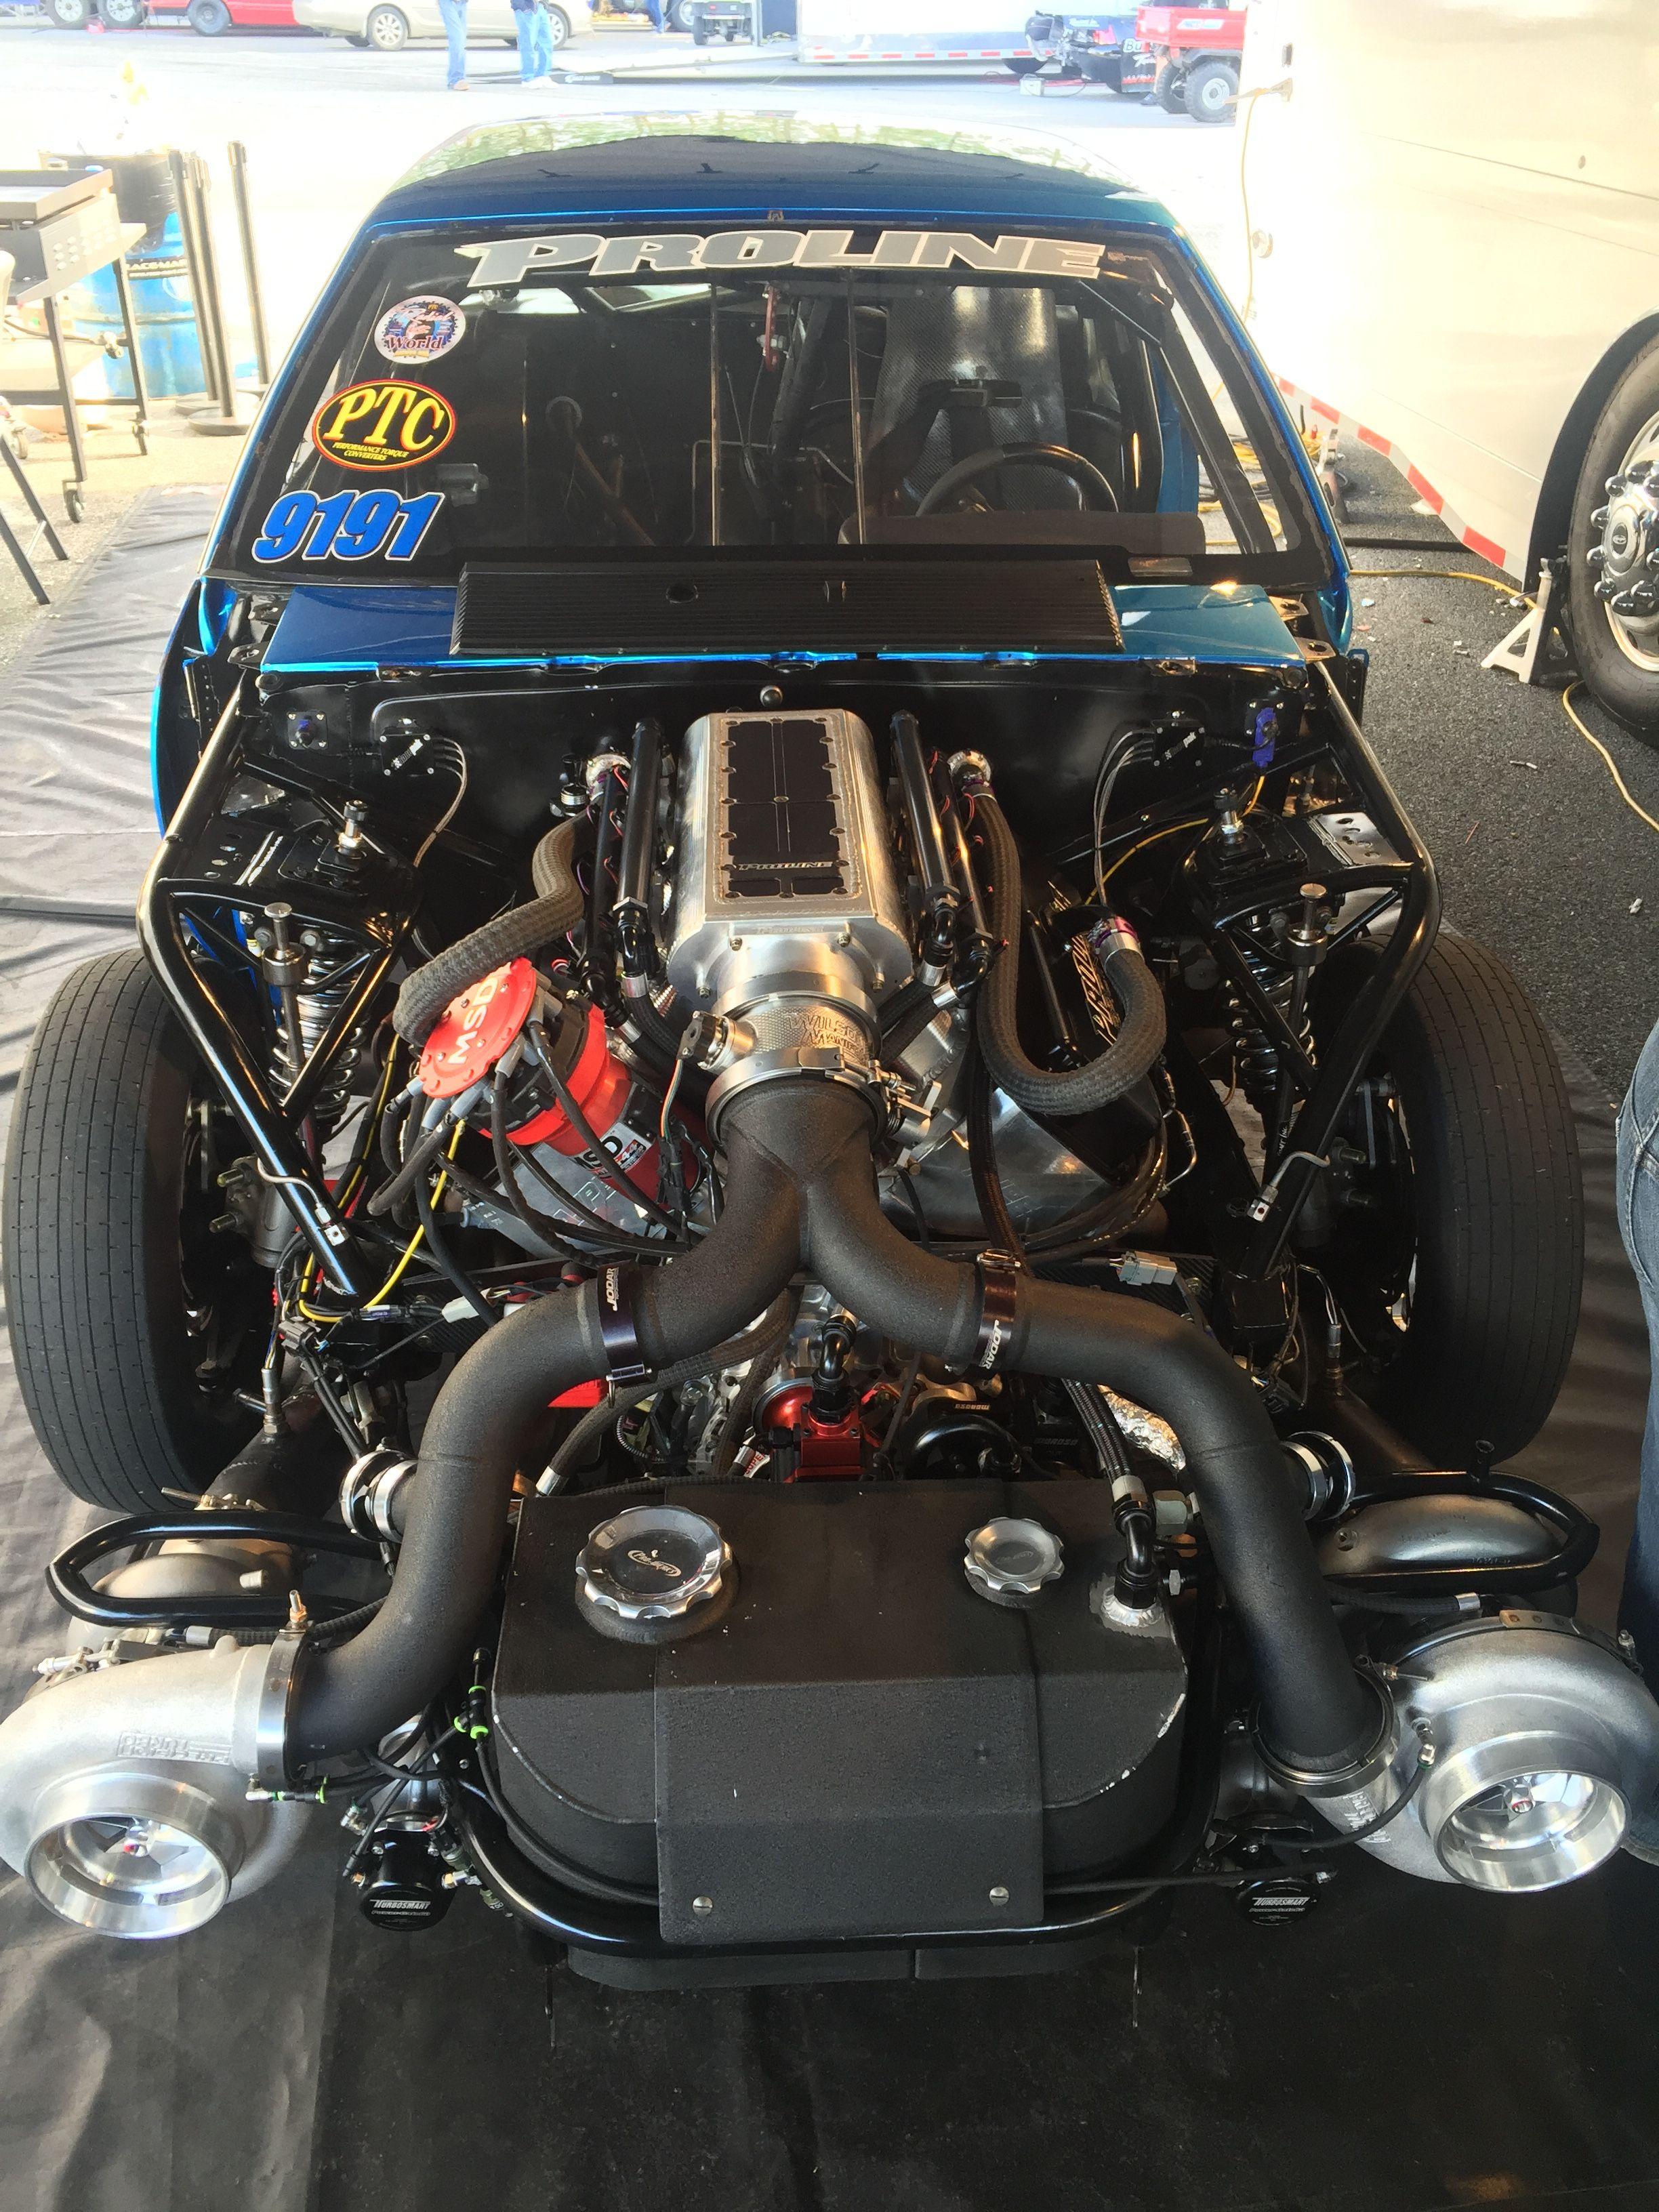 hight resolution of fletcher cox 481x 572 motor turbo car twin turbo trucks and girls